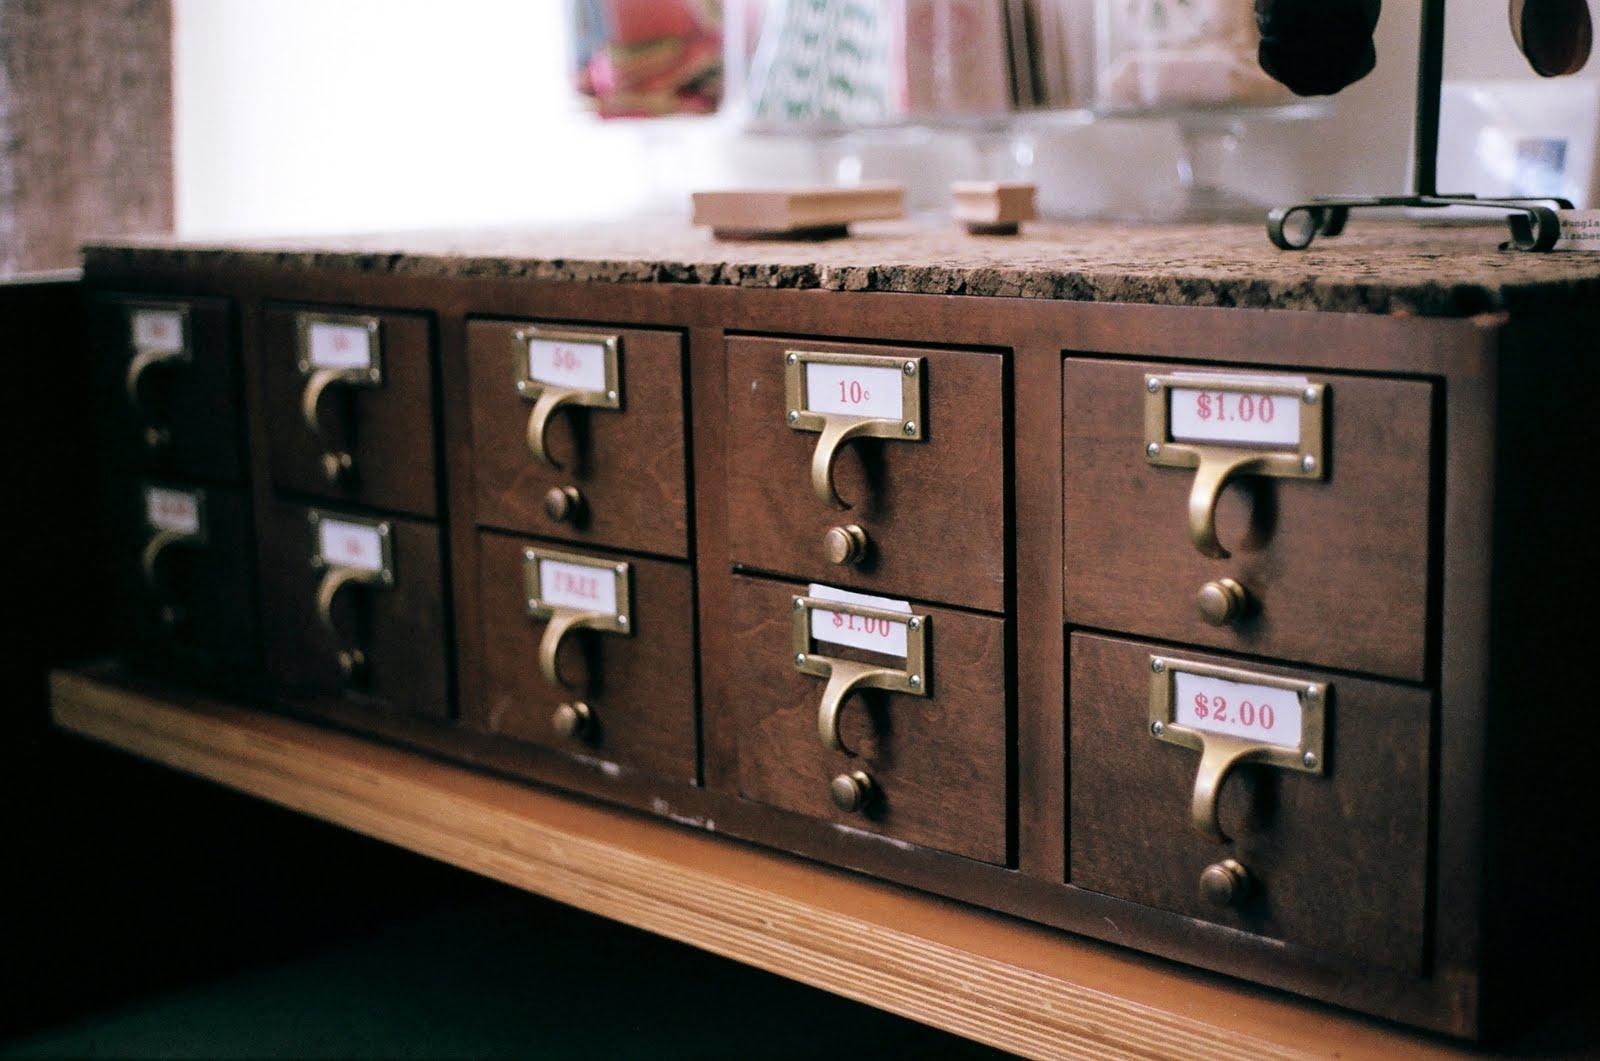 http://3.bp.blogspot.com/_zJ6zdRxnutQ/TJFasAhnA3I/AAAAAAAAFSo/f55E37Kim7c/s1600/curiosity+drawers.jpg